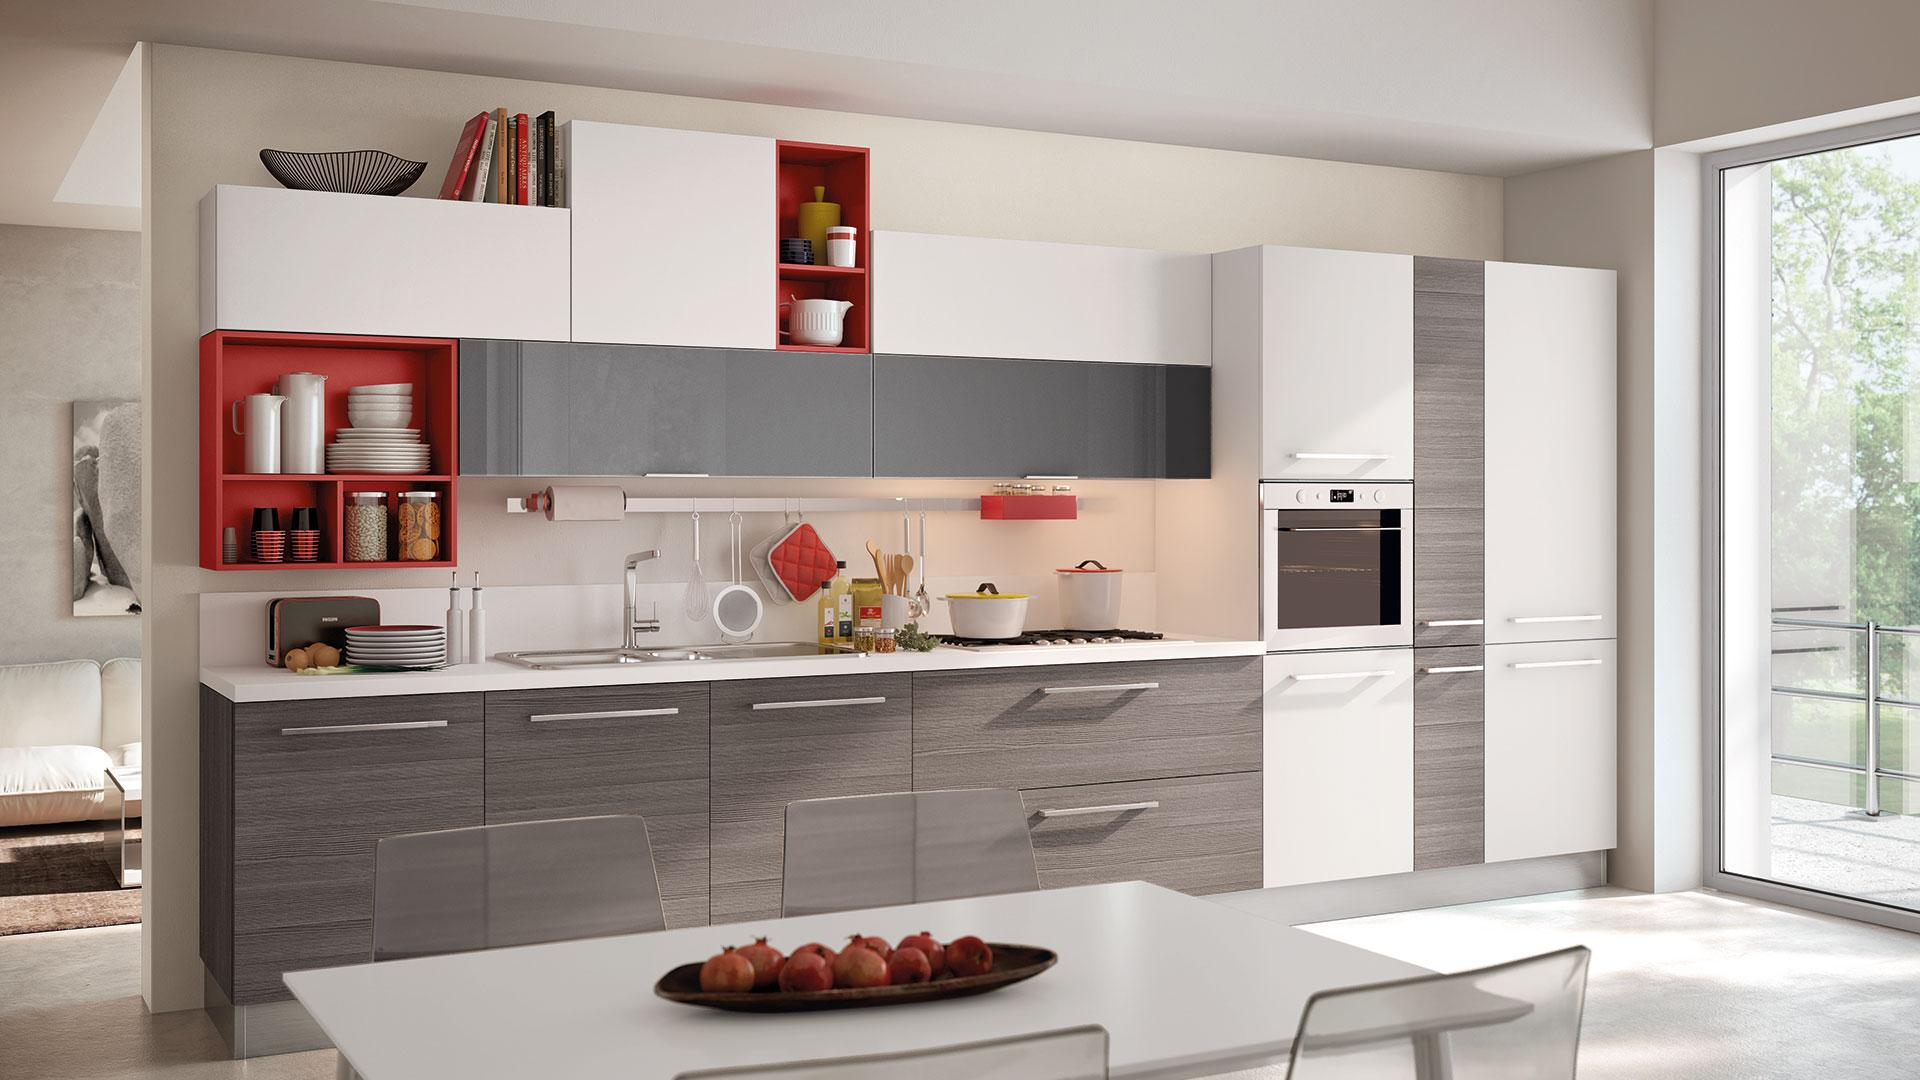 Come disporre i mobili in cucina dettagli e consigli da - Mobili x cucina ...